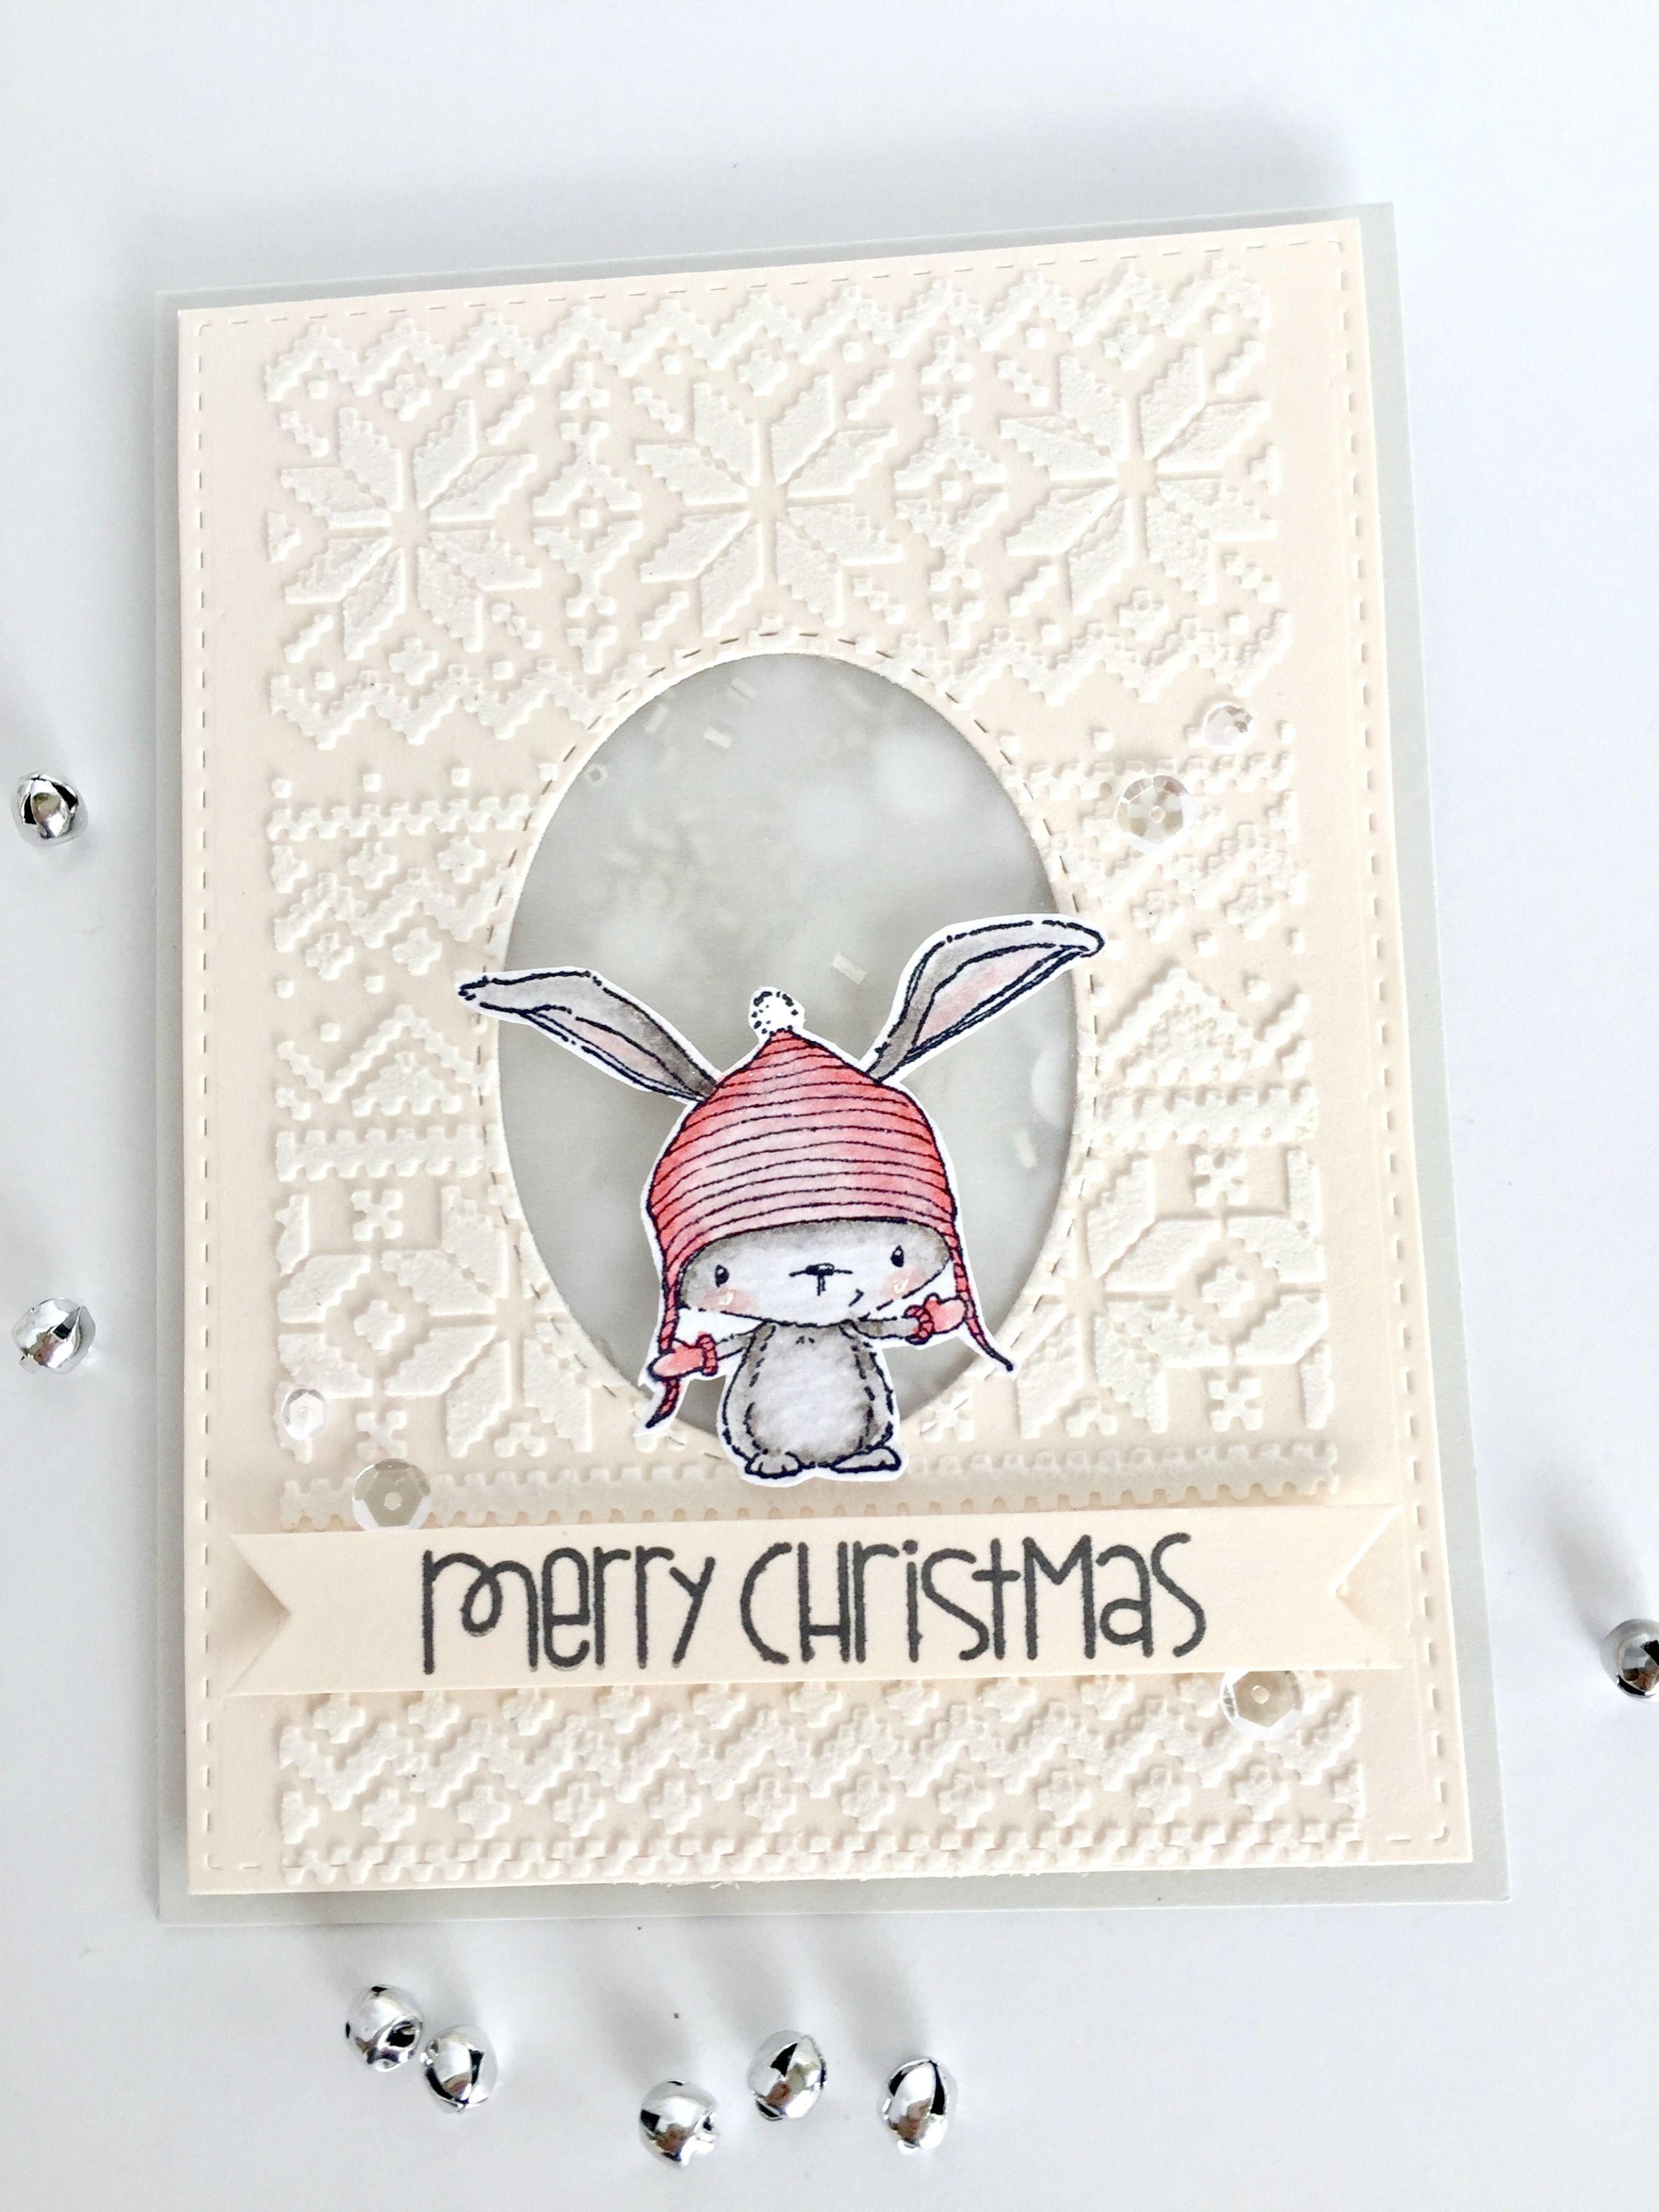 Pin by Jayne Sadler on Card Ideas Christmas Pinterest